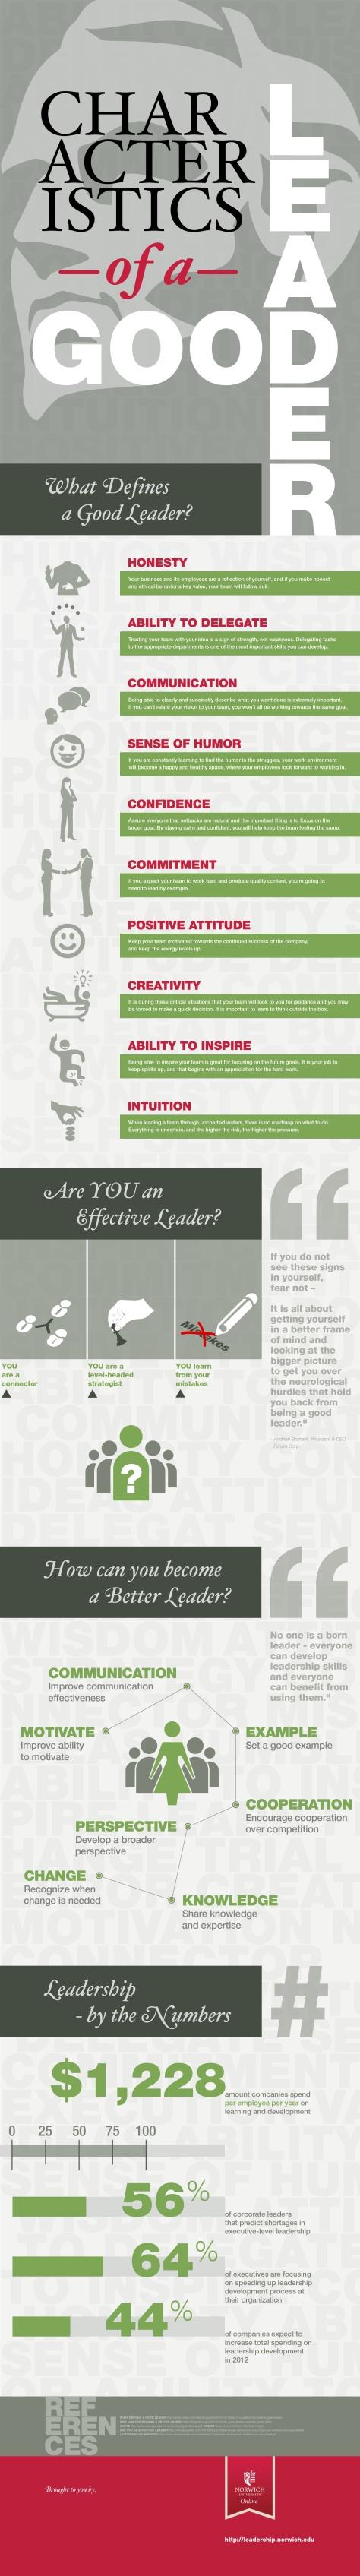 characteristics-of-a-good-leader_5212a7bfc20fd